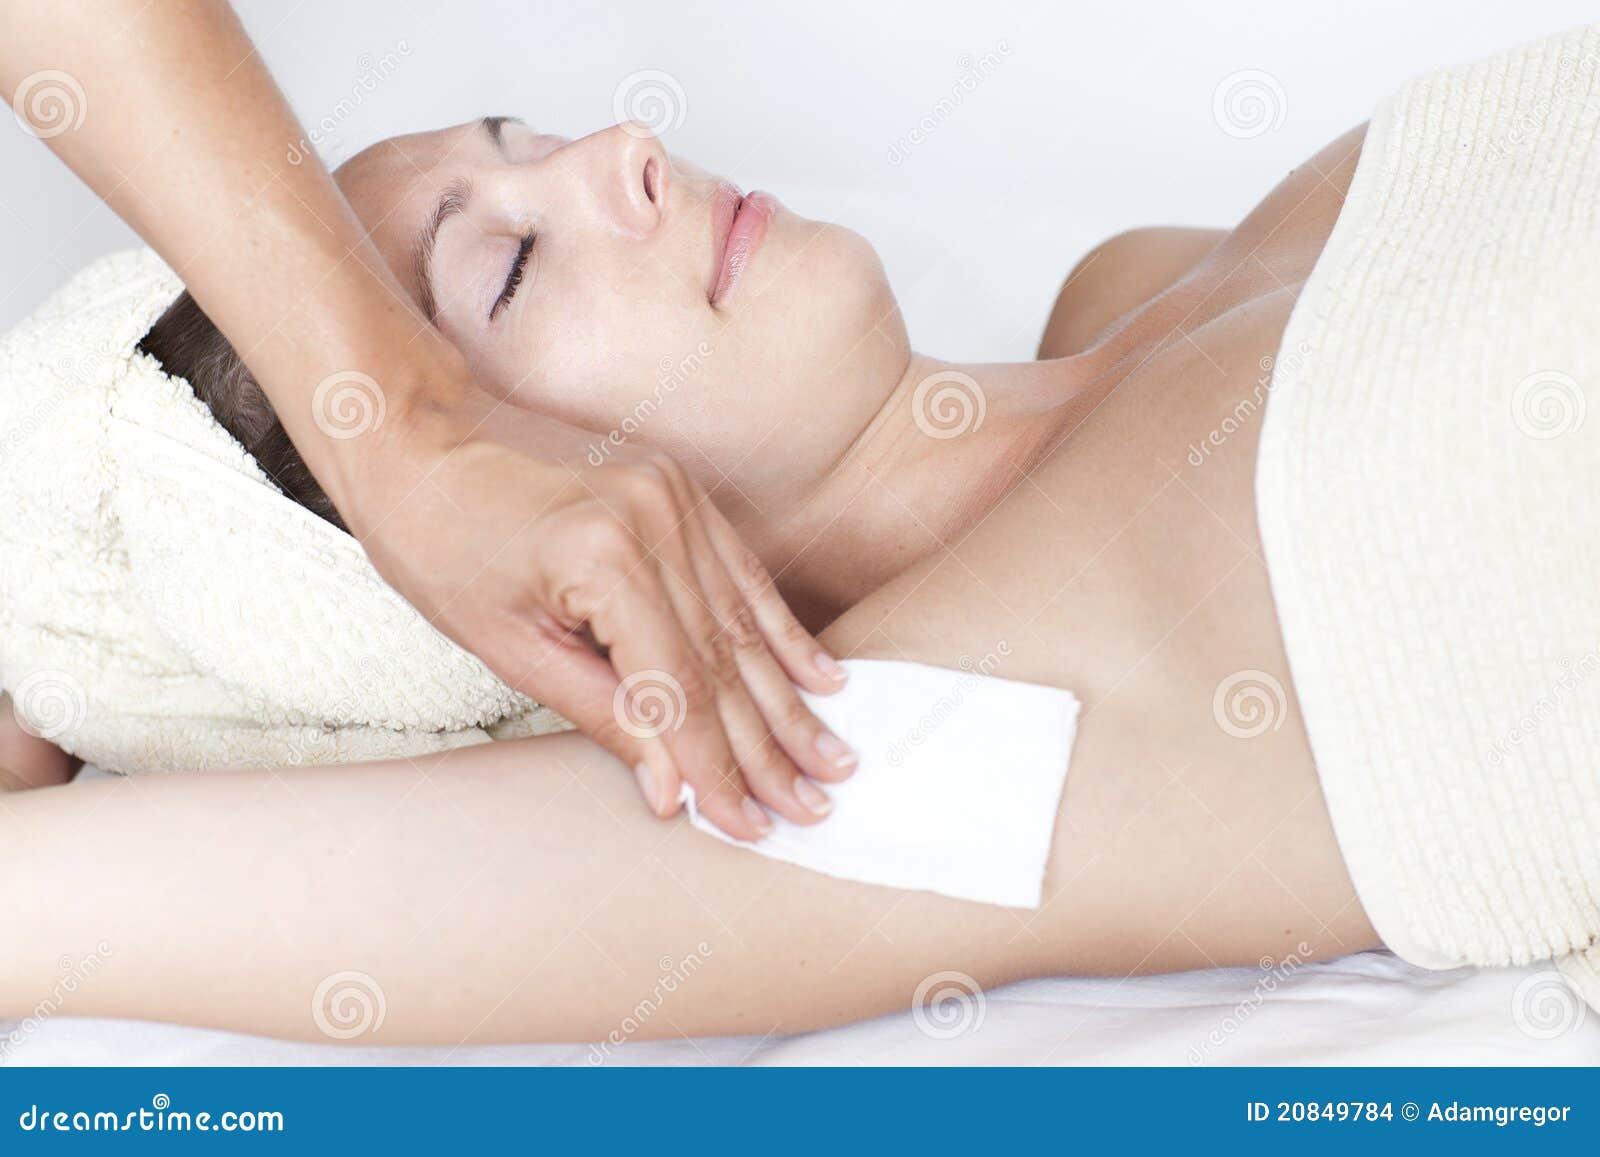 https://thumbs.dreamstime.com/z/armpit-depilation-20849784.jpg